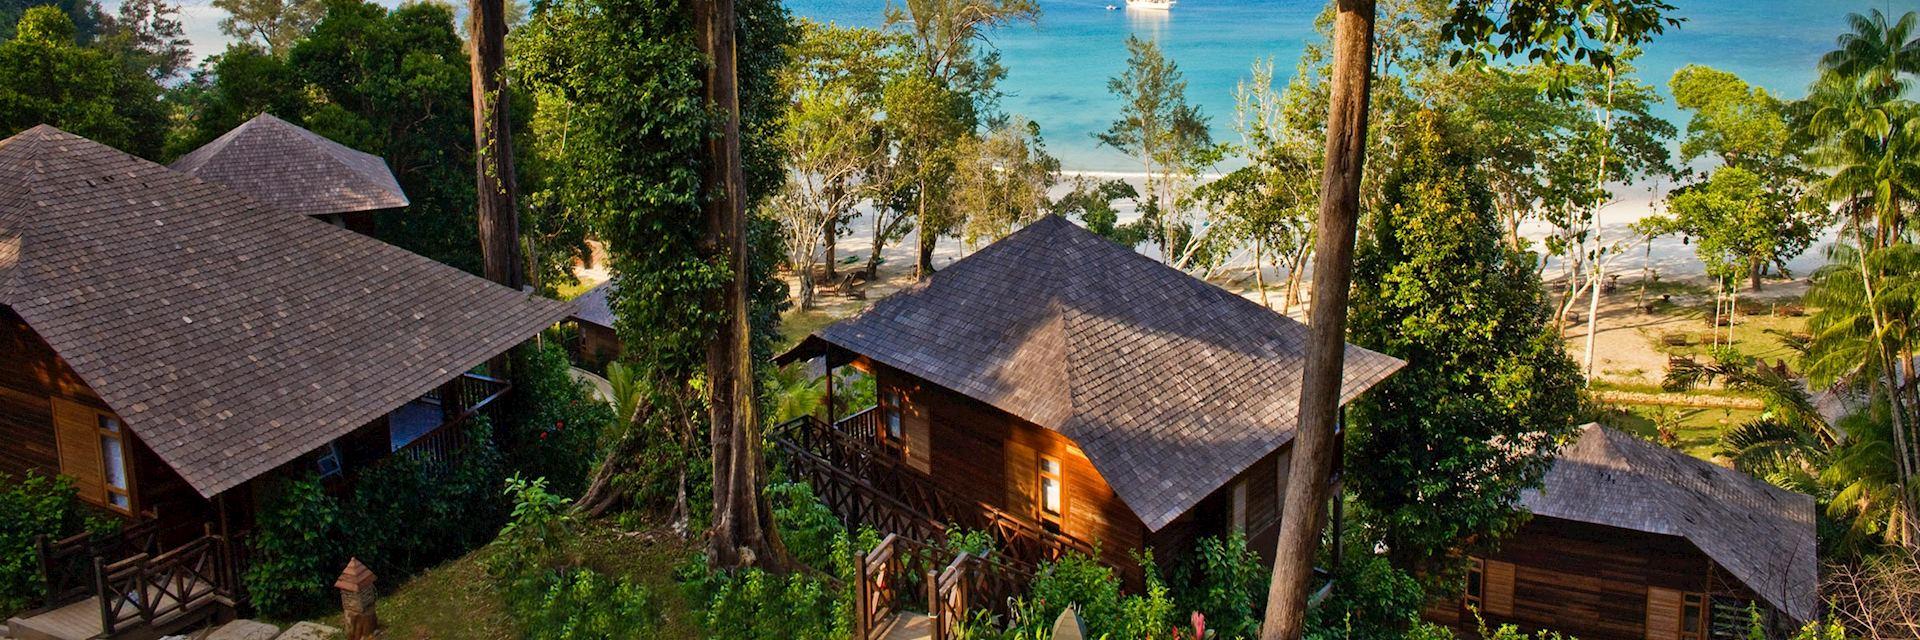 Bunga Raya Island Resort, Borneo